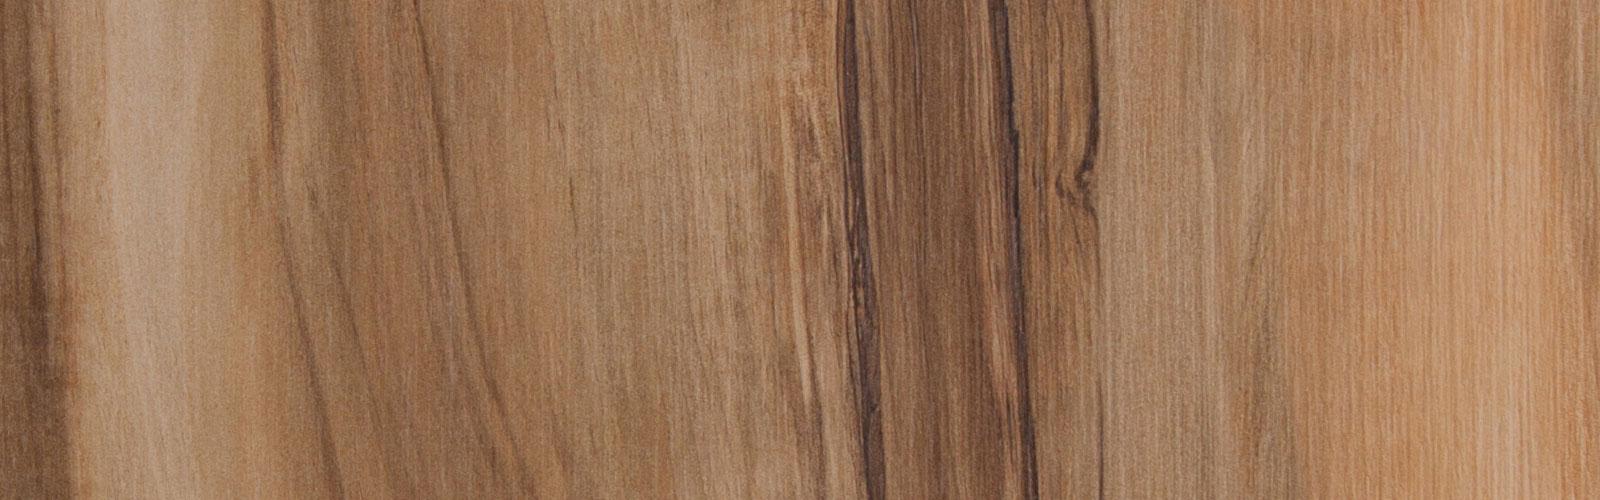 Wood Grain Laminates | Bella Laminati on